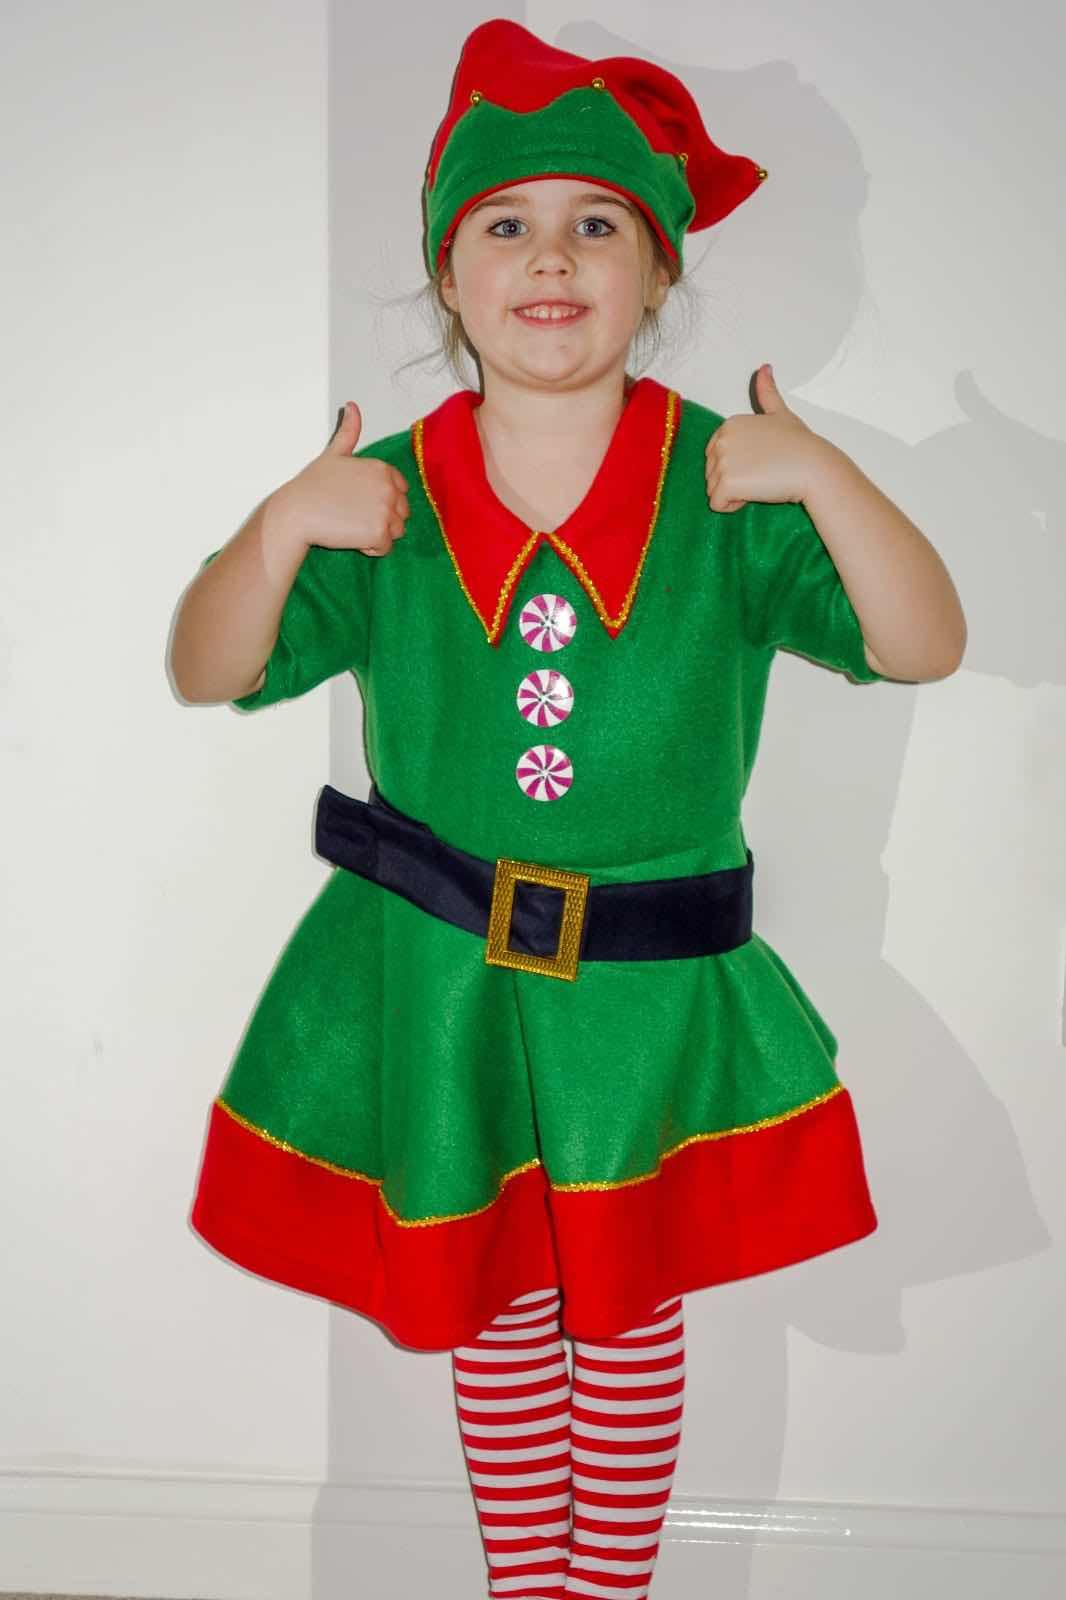 Elf in the nativity